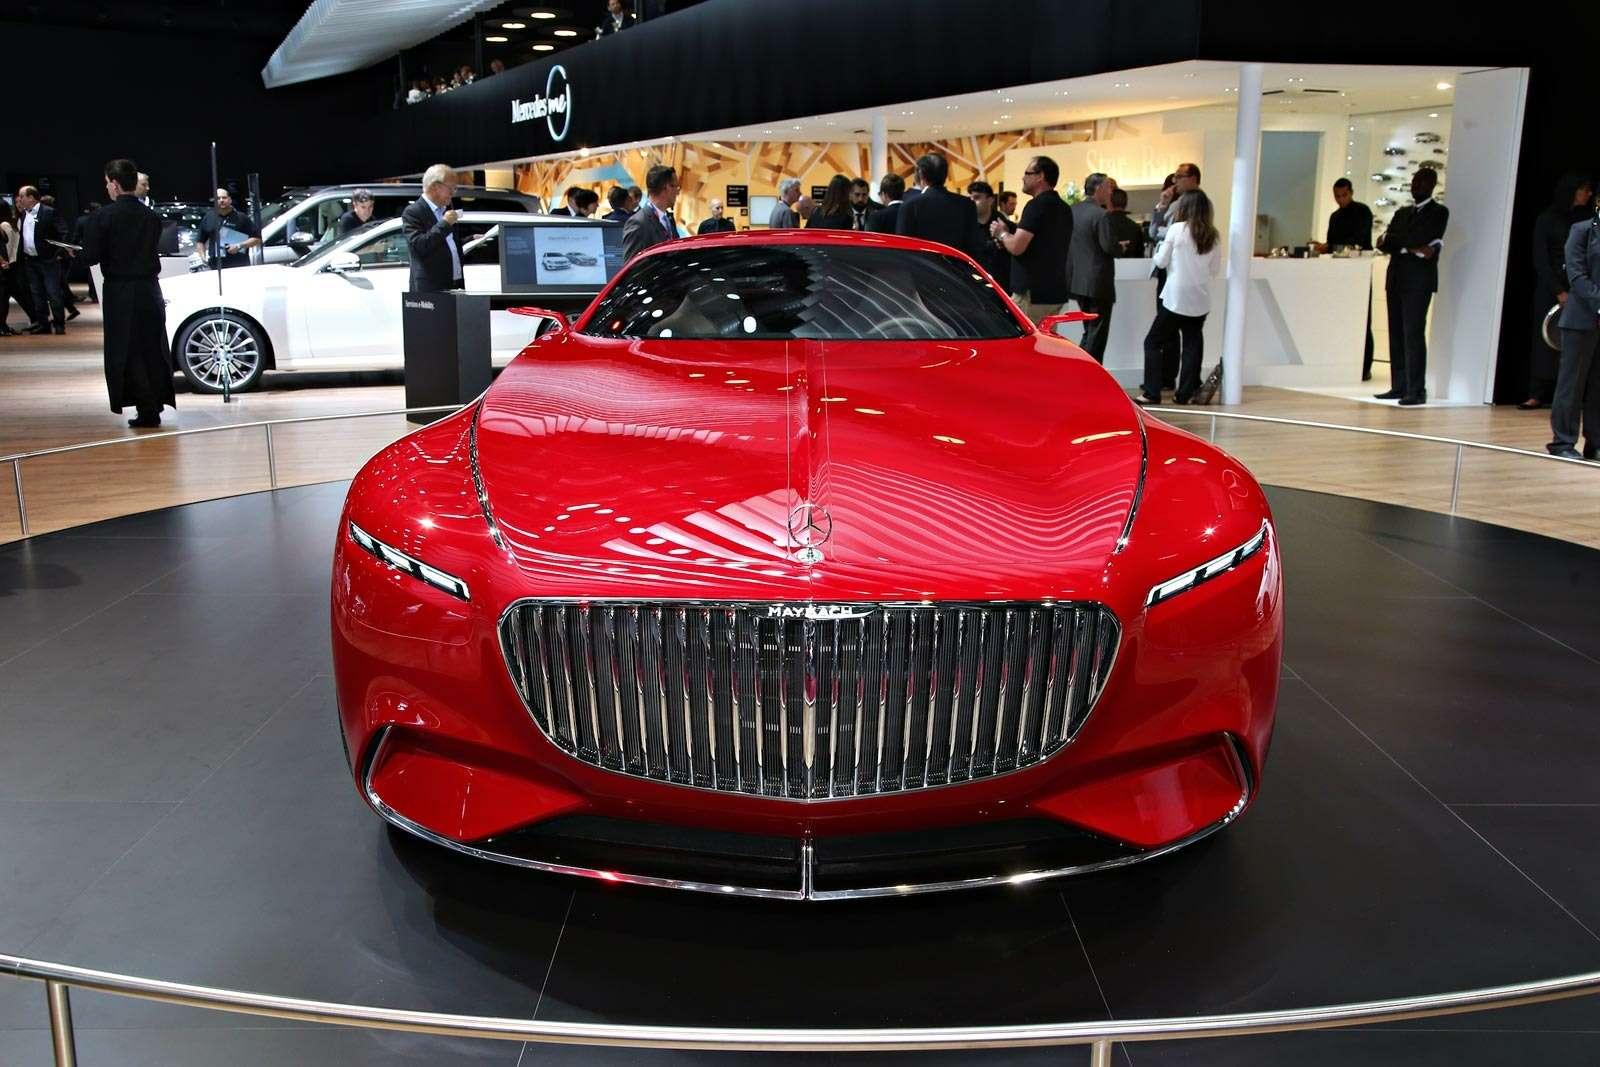 Самый красивый автомобиль Парижа: Vision Mercedes-Maybach 6завоевывает сердца— фото 643573